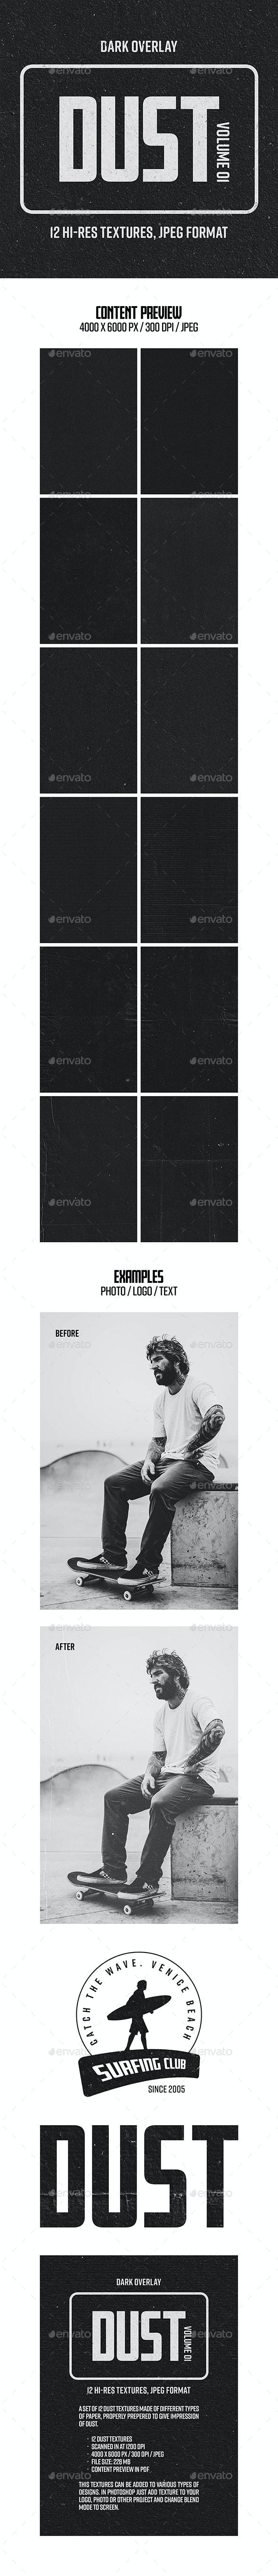 Dust Textures - Vol. 01 - Paper Textures